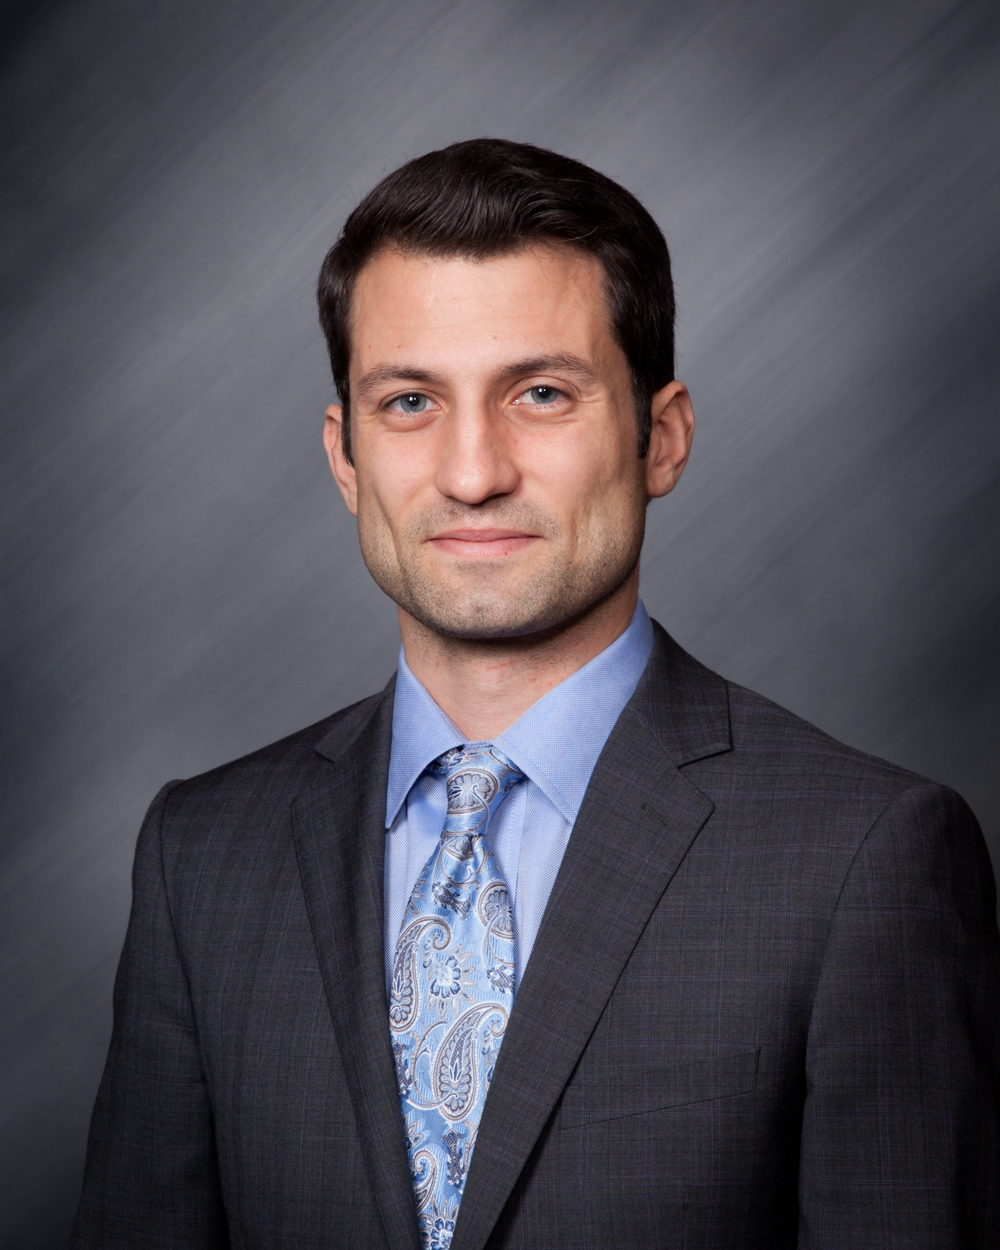 Personal injury attorney Michael Serra